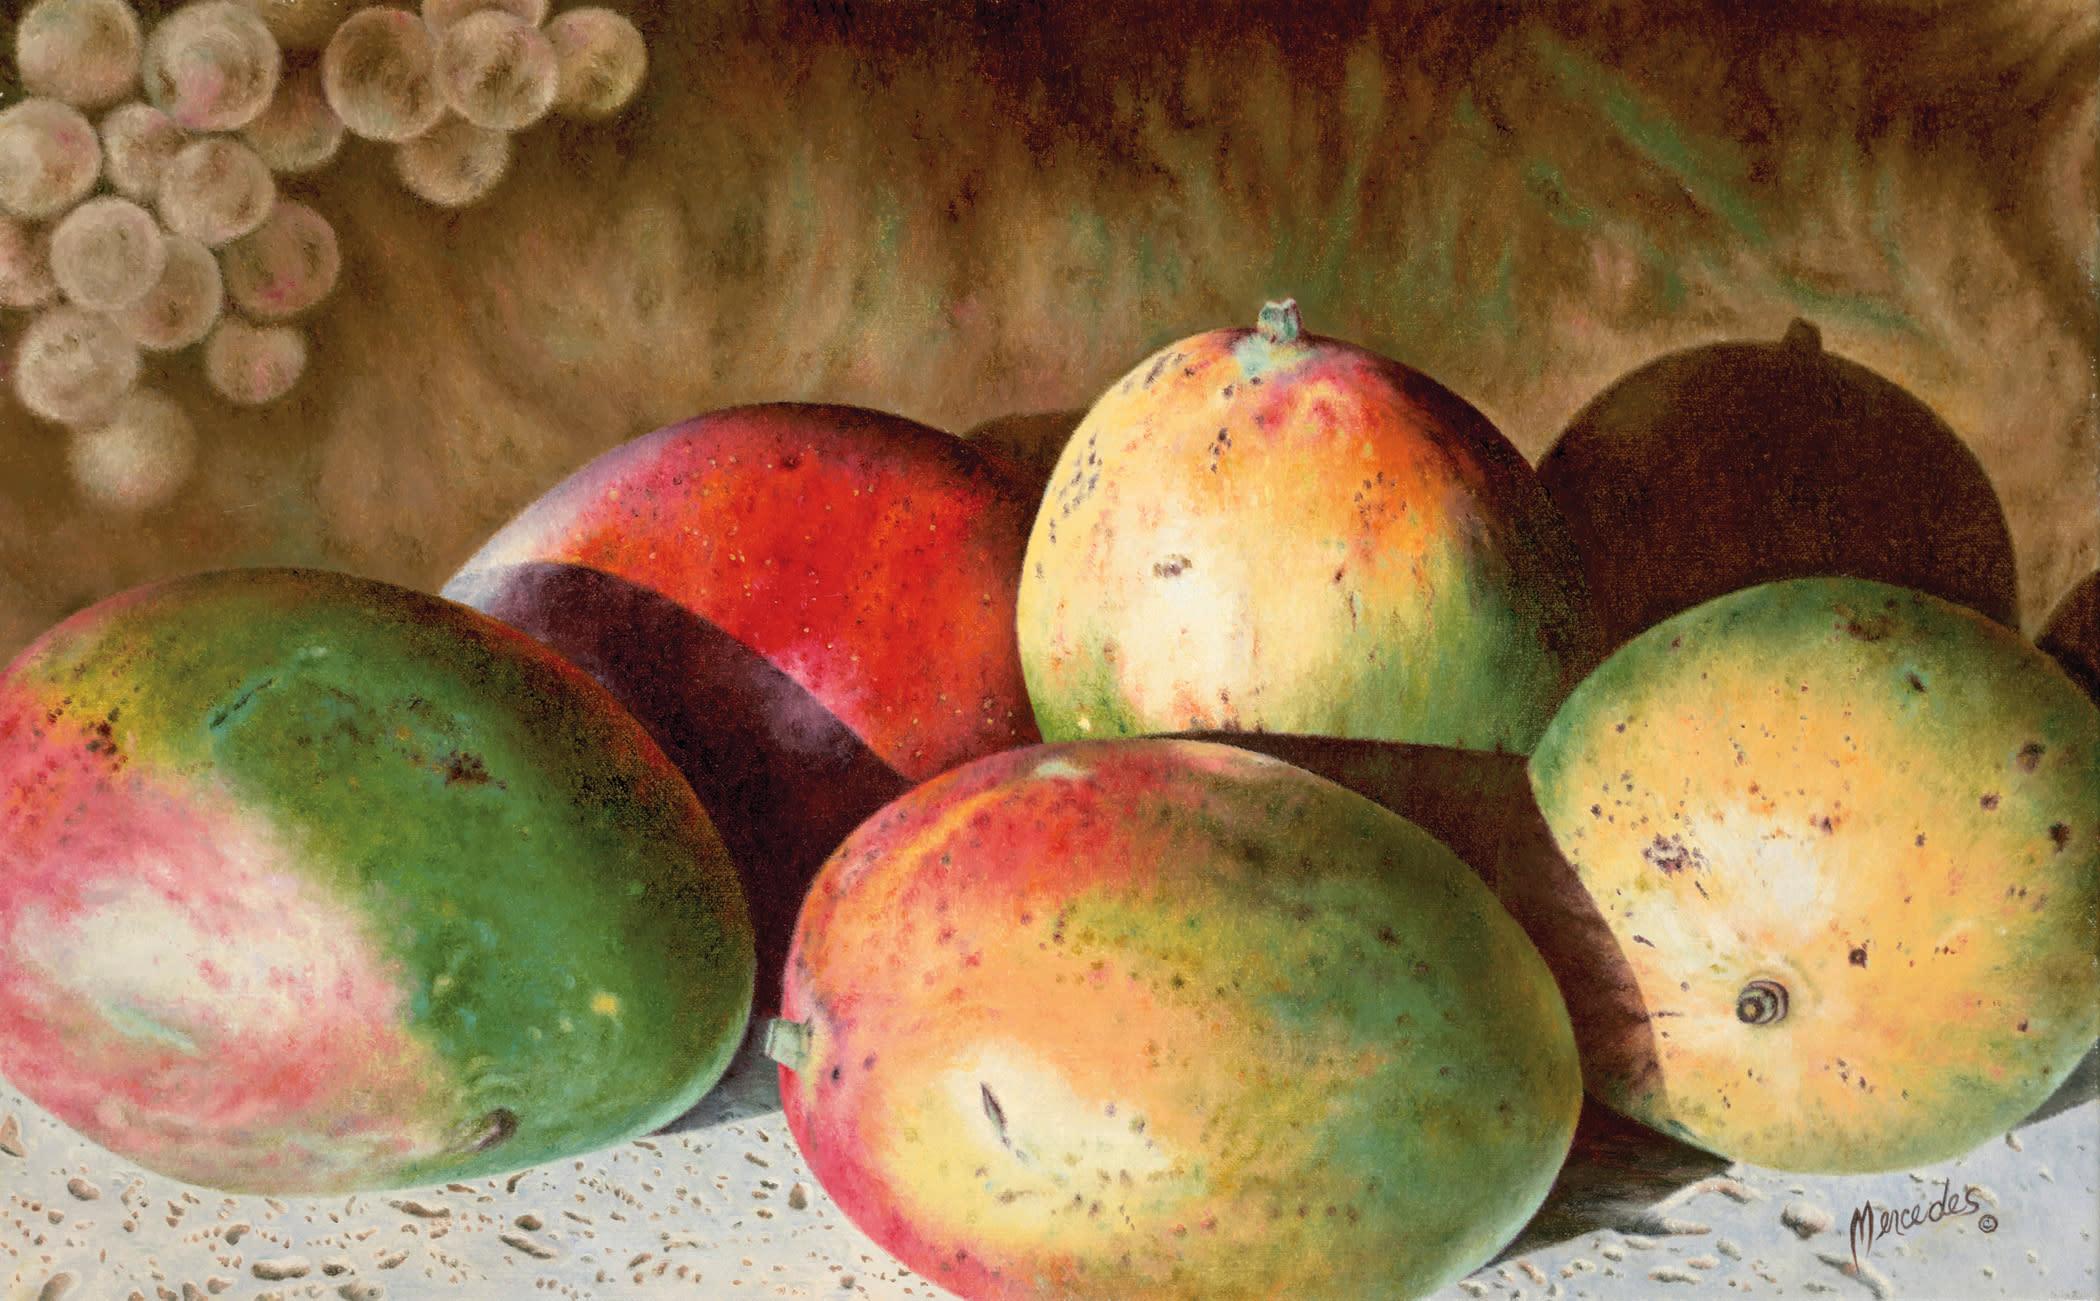 Mangos from harvest changed to rgb3 21 13 b2opnr